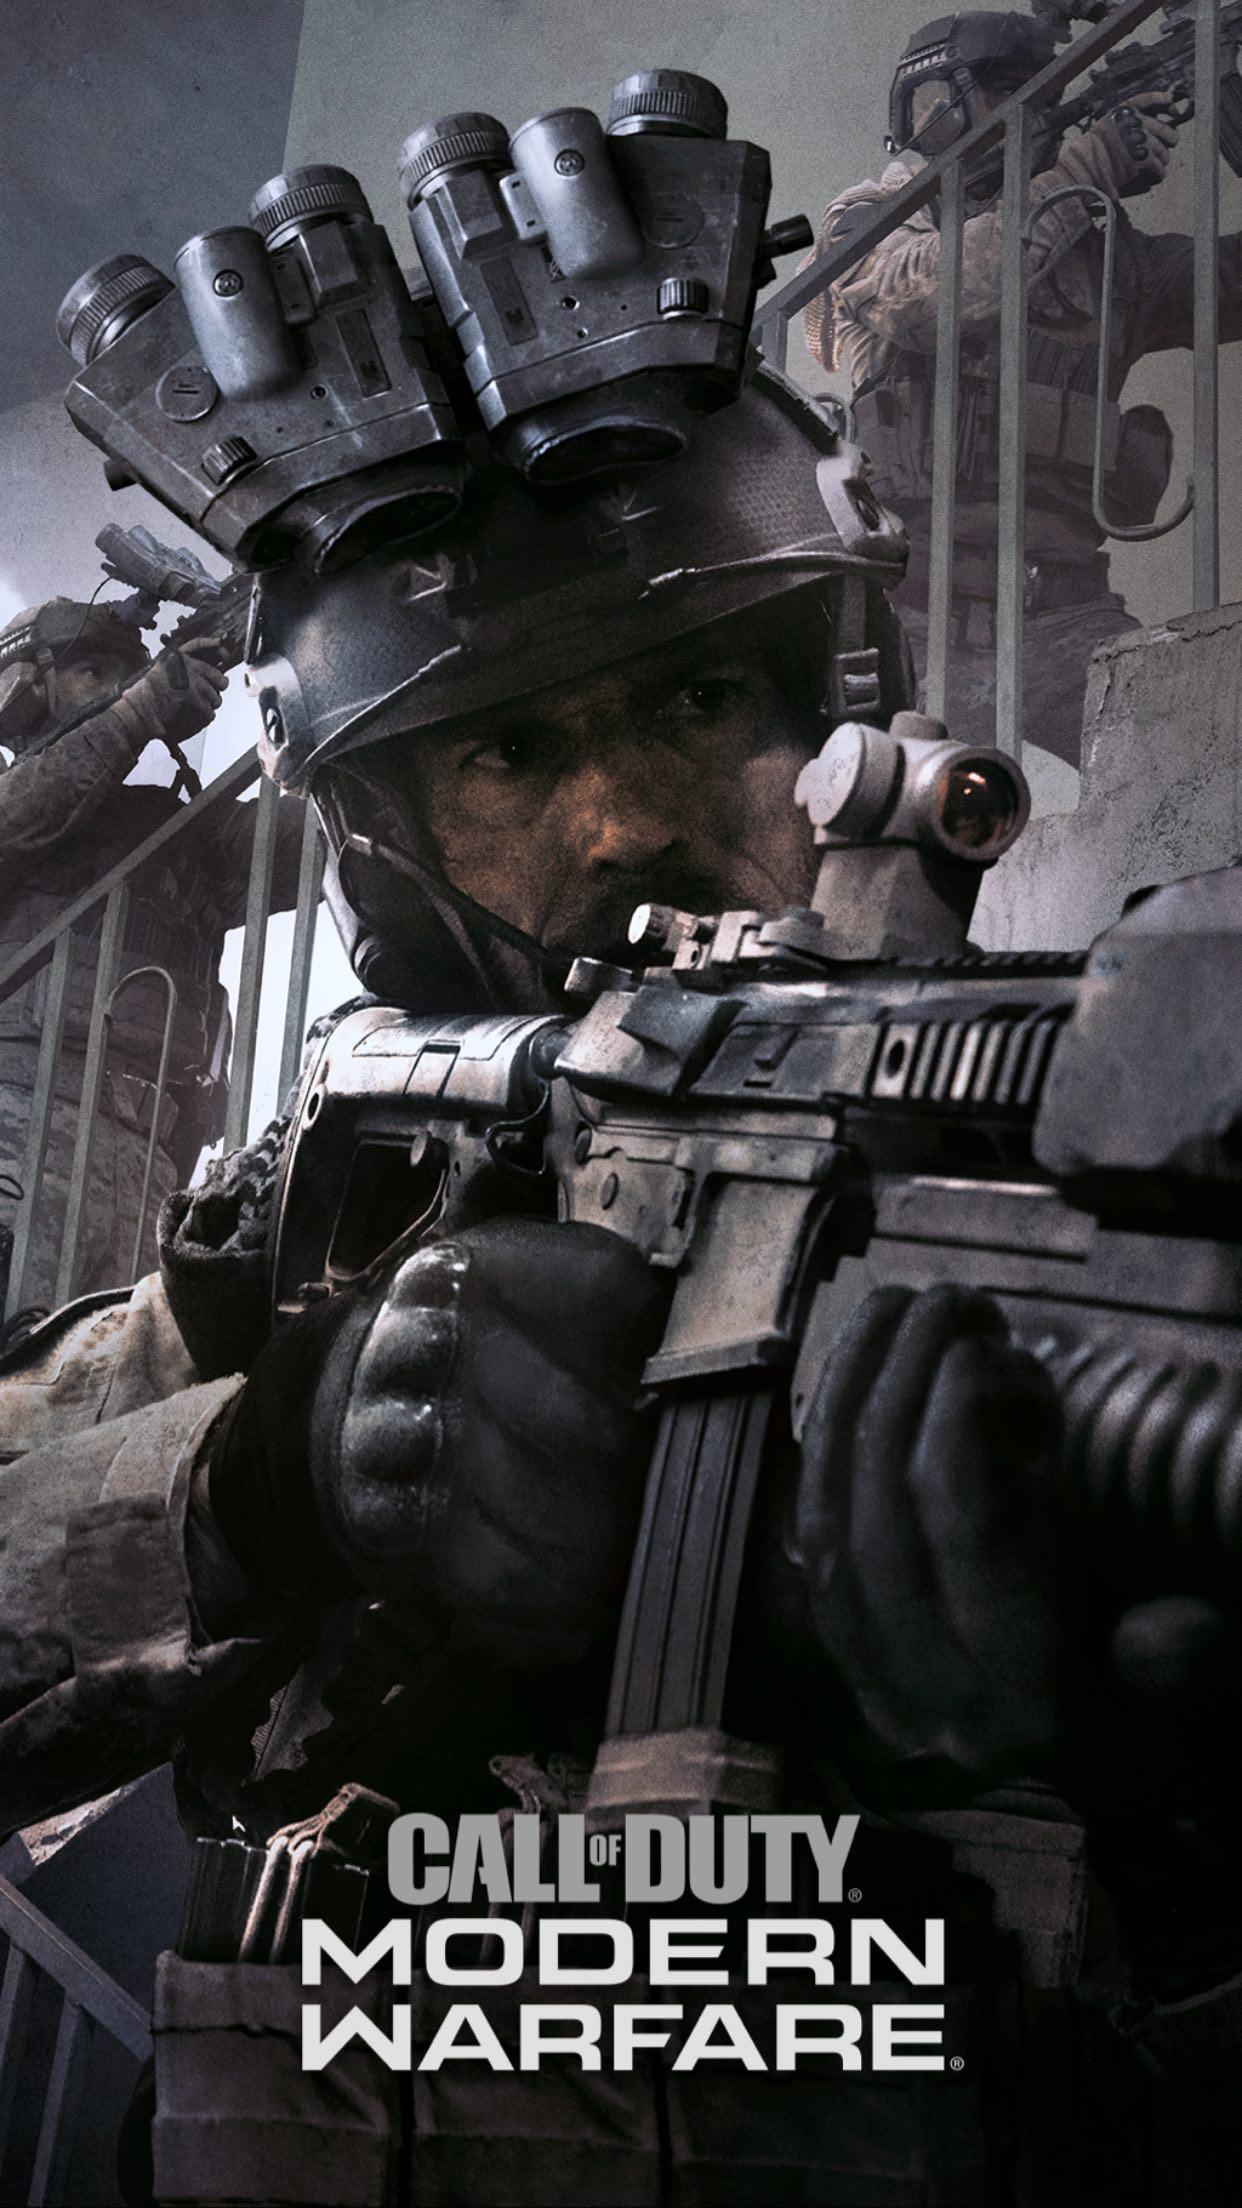 Call of duty Modern Warfare Mobile Phone Wallpaper set 14 of 17 1242x2208